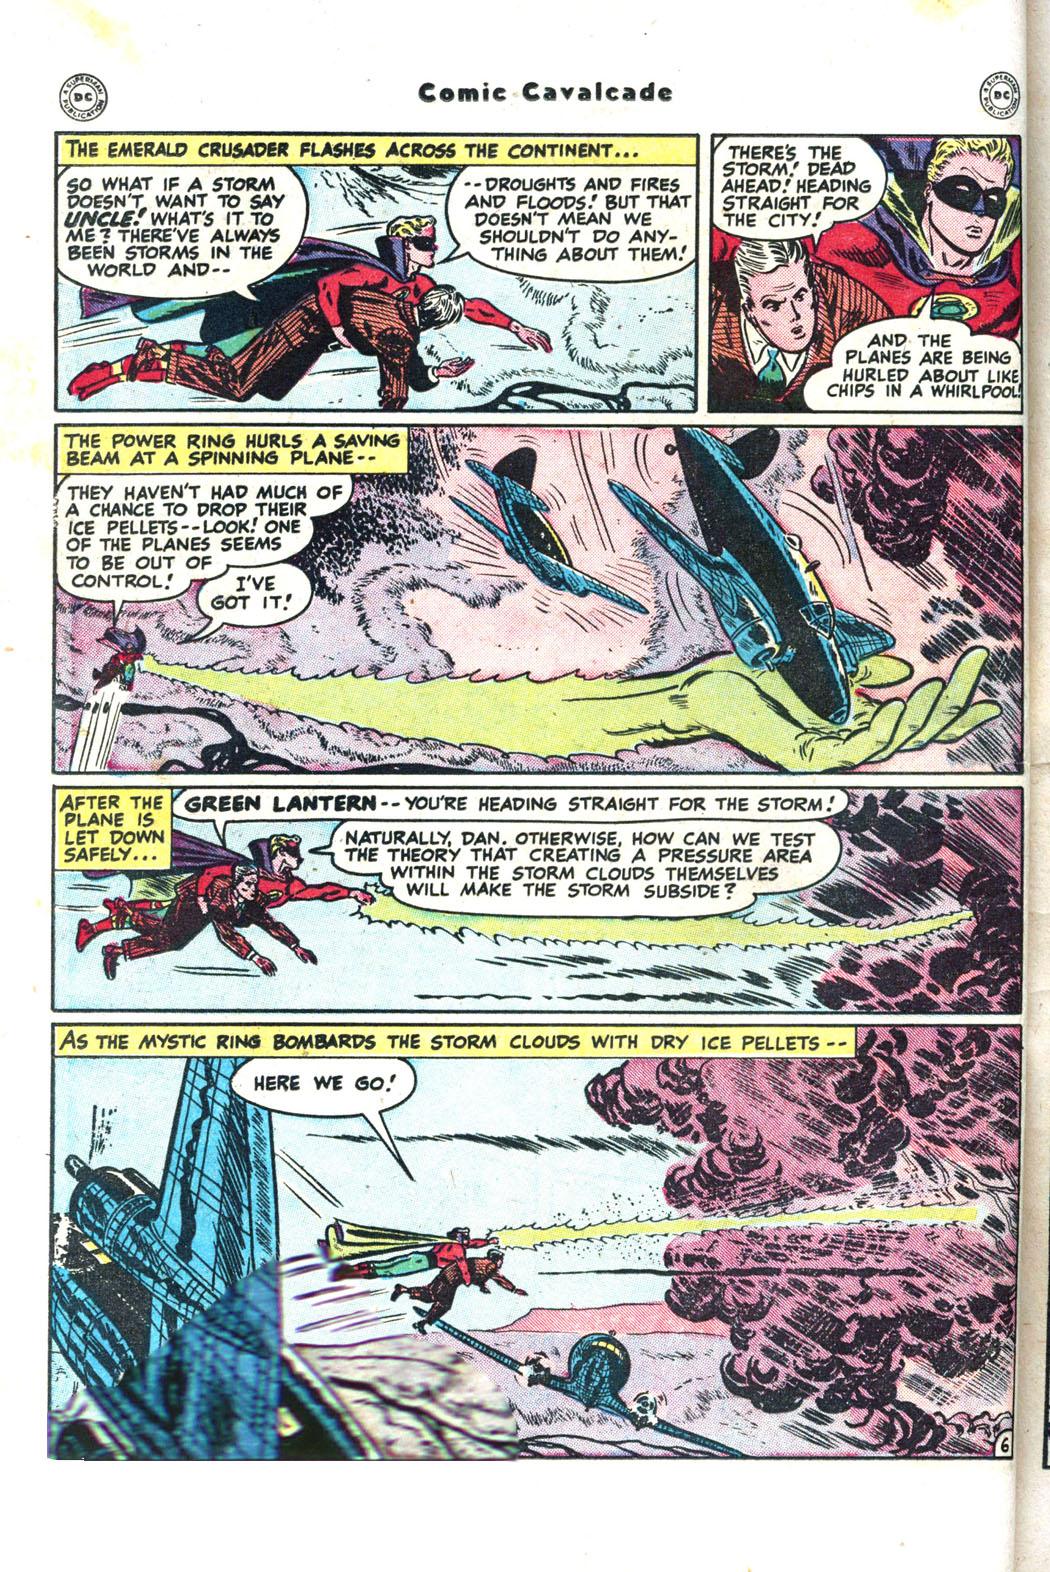 Comic Cavalcade issue 26 - Page 32